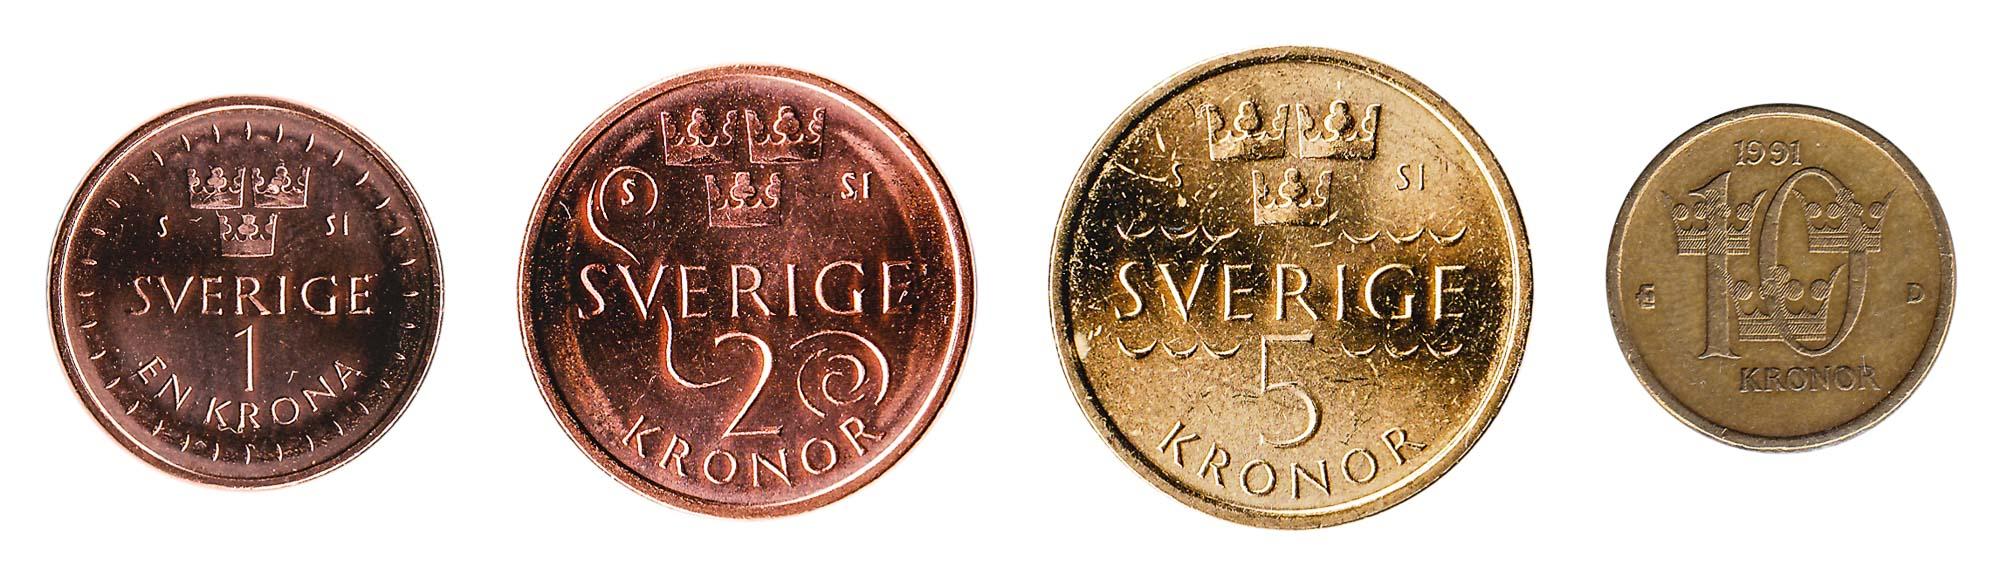 Swedish krona coins